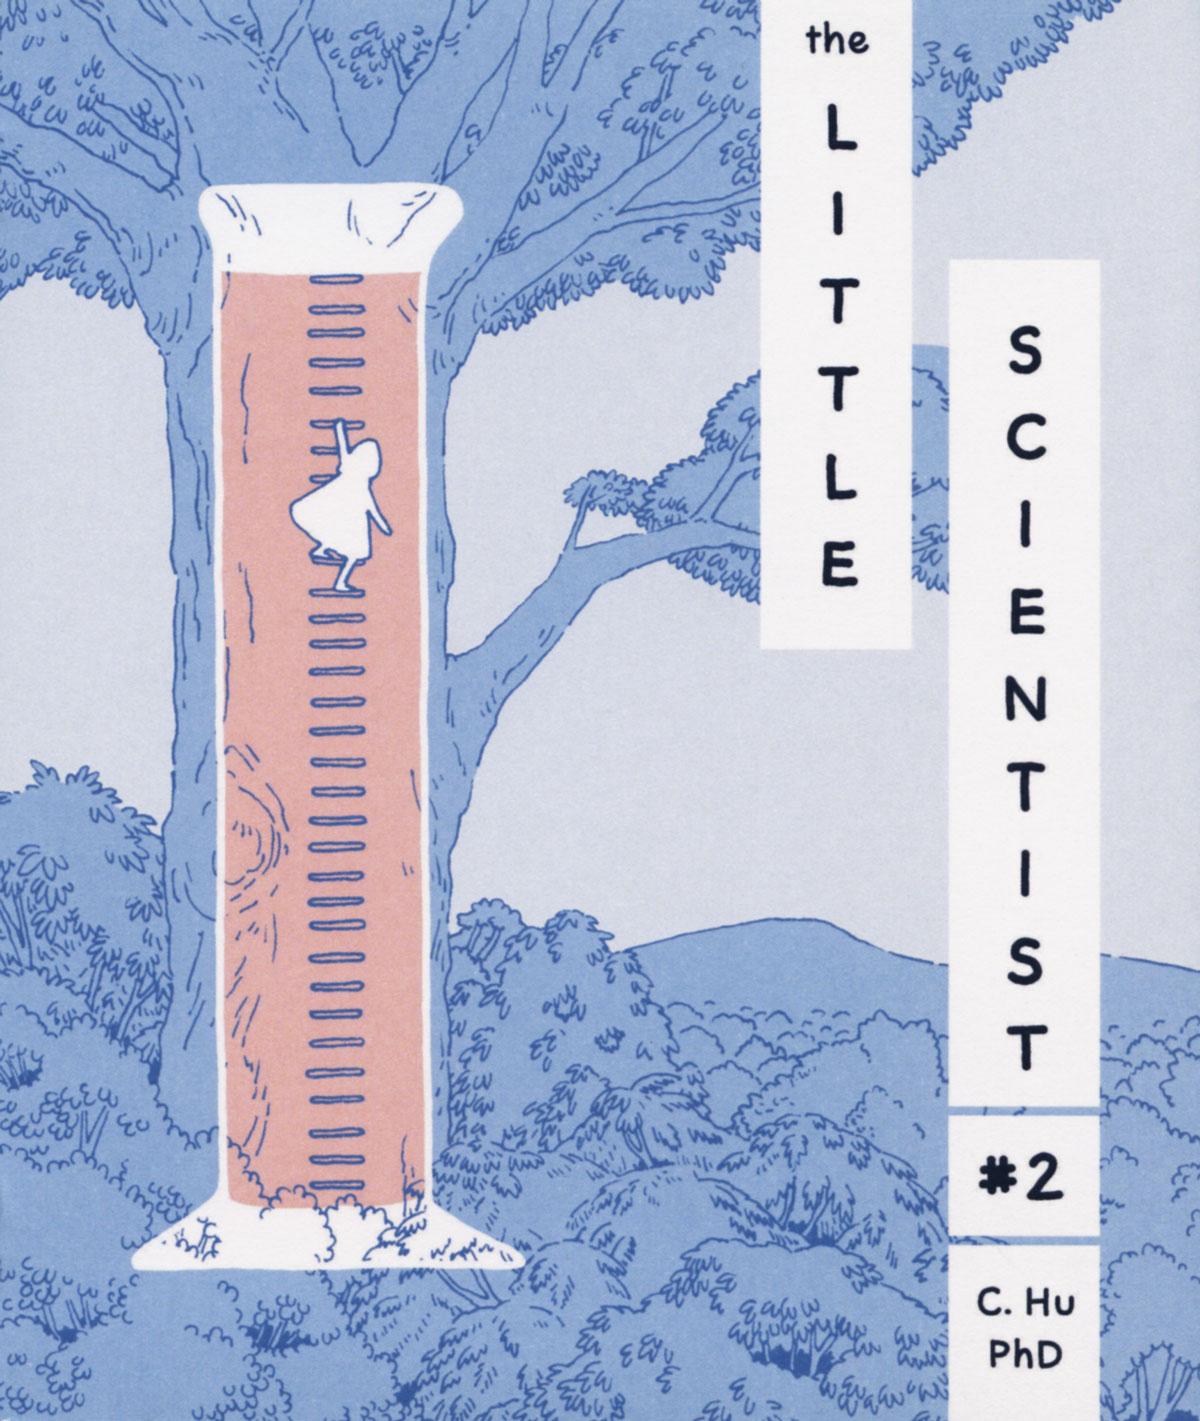 The Little Scientist No. 2 by Caroline Hu PhD